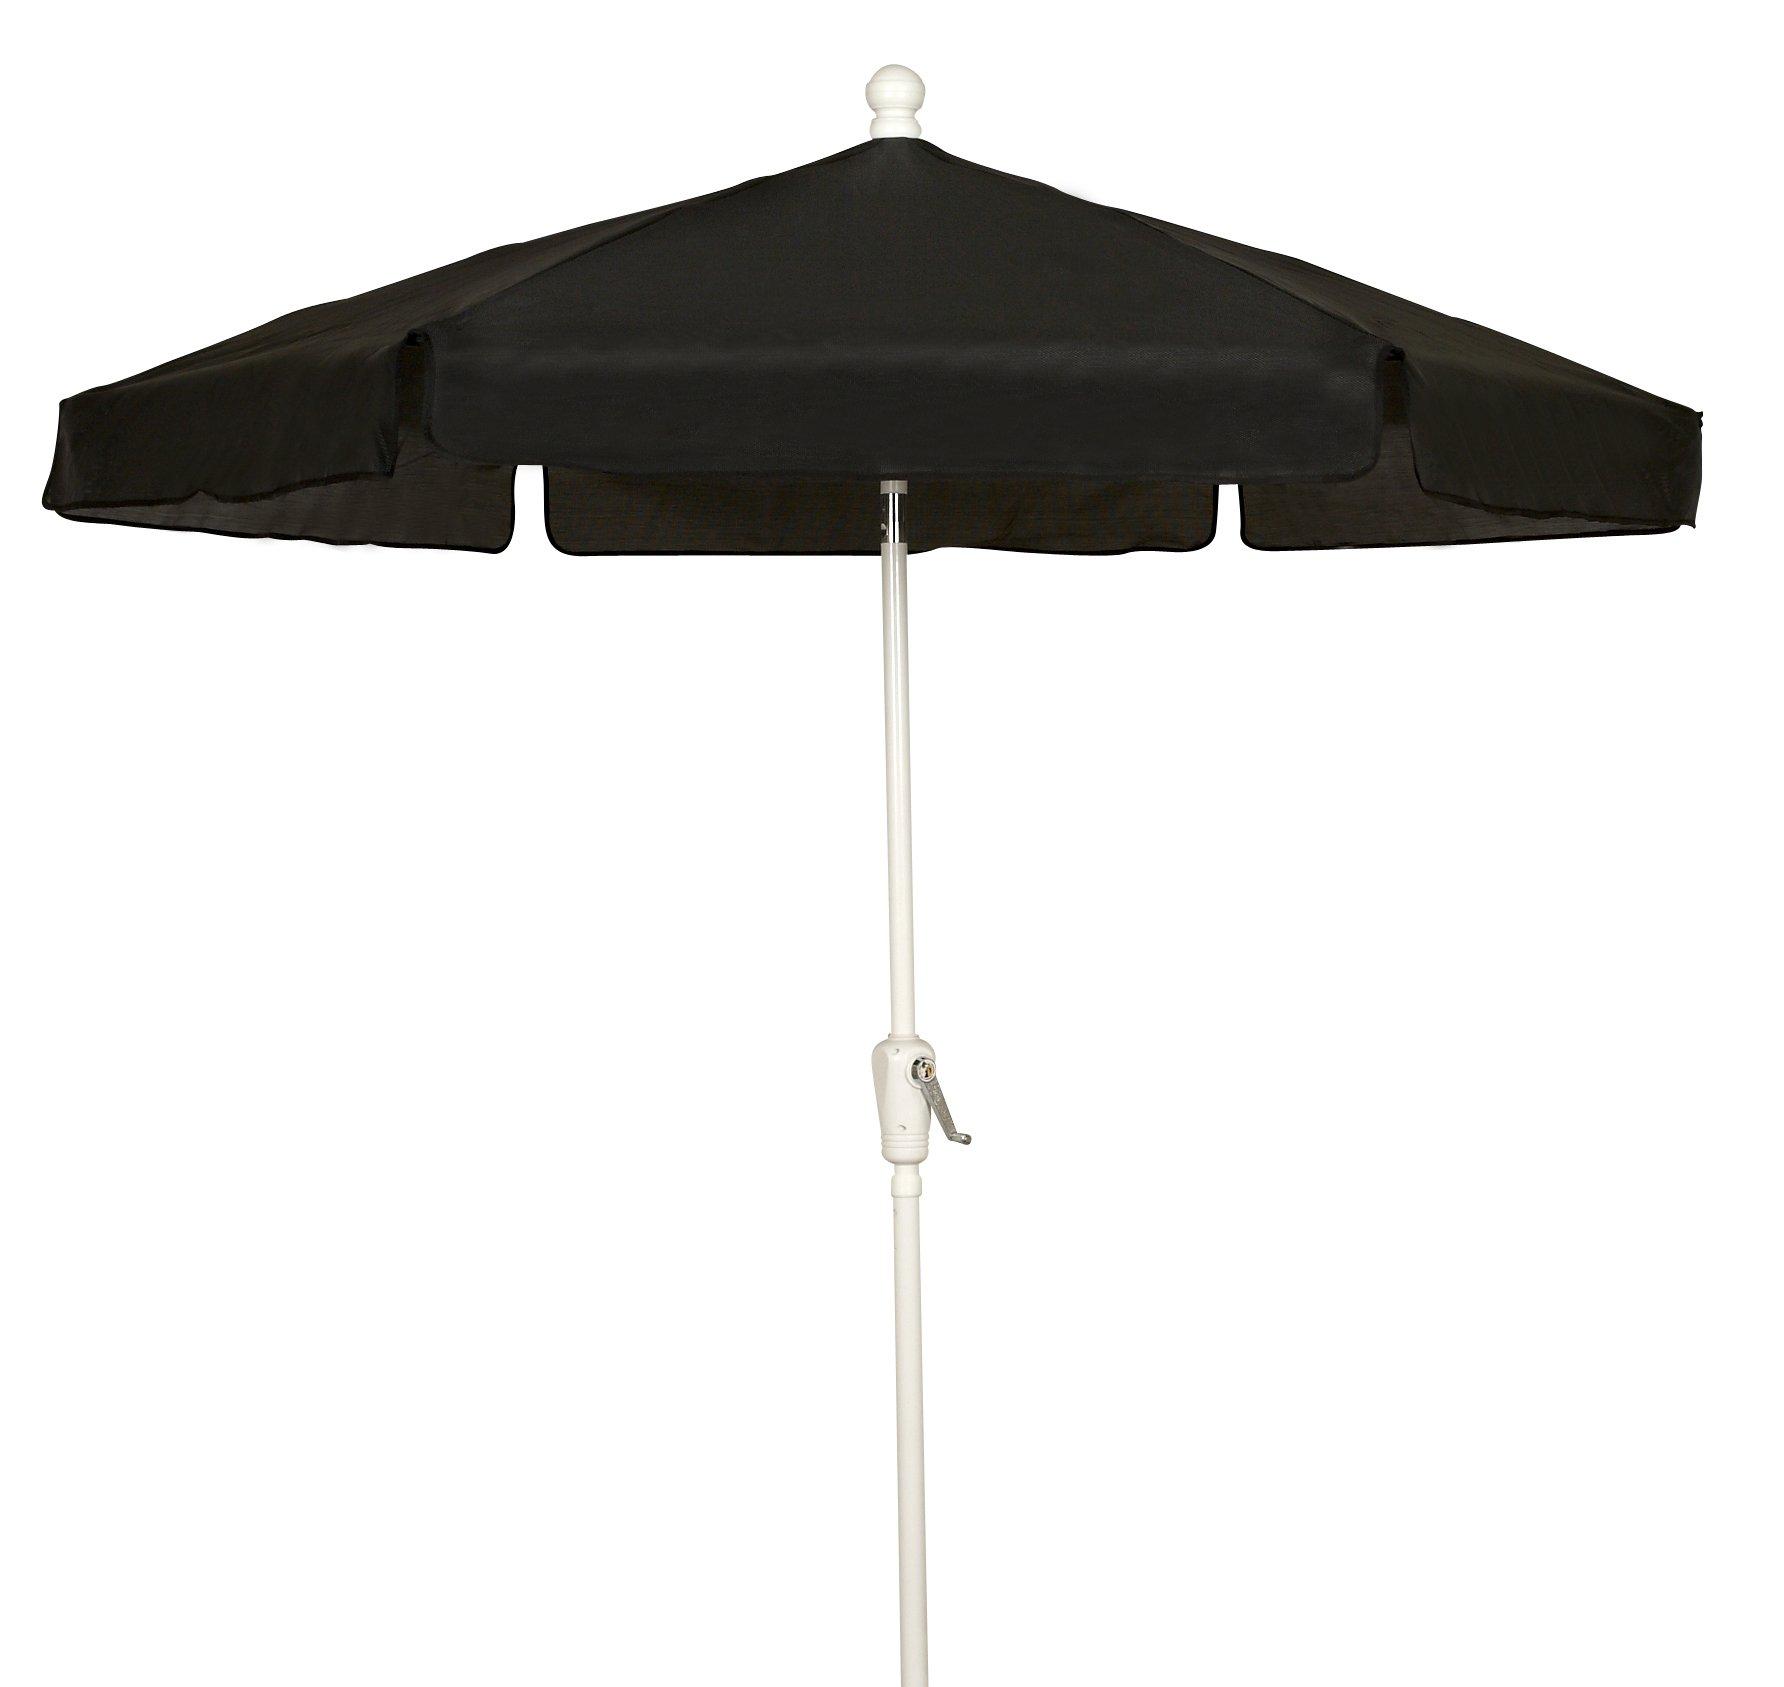 FiberBuilt Umbrellas Garden Umbrella, 7.5 Foot Black Canopy and White Pole